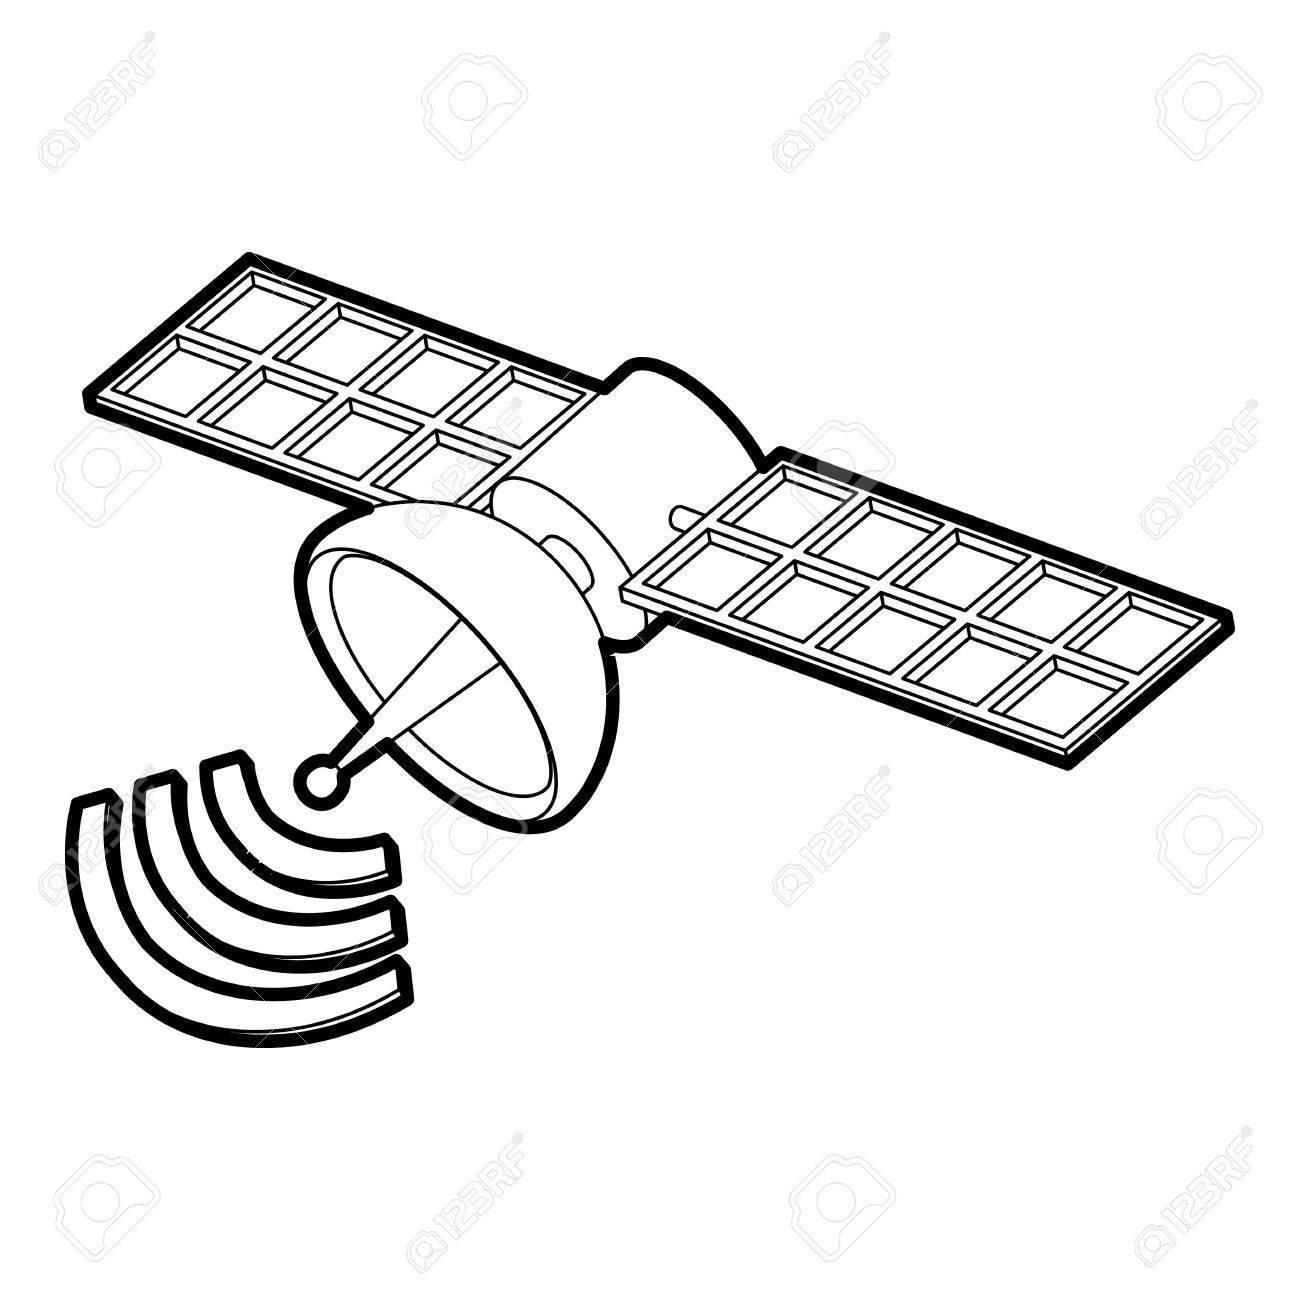 1300x1300 Space Satellite Icon. Outline Illustration Of Space Satellite